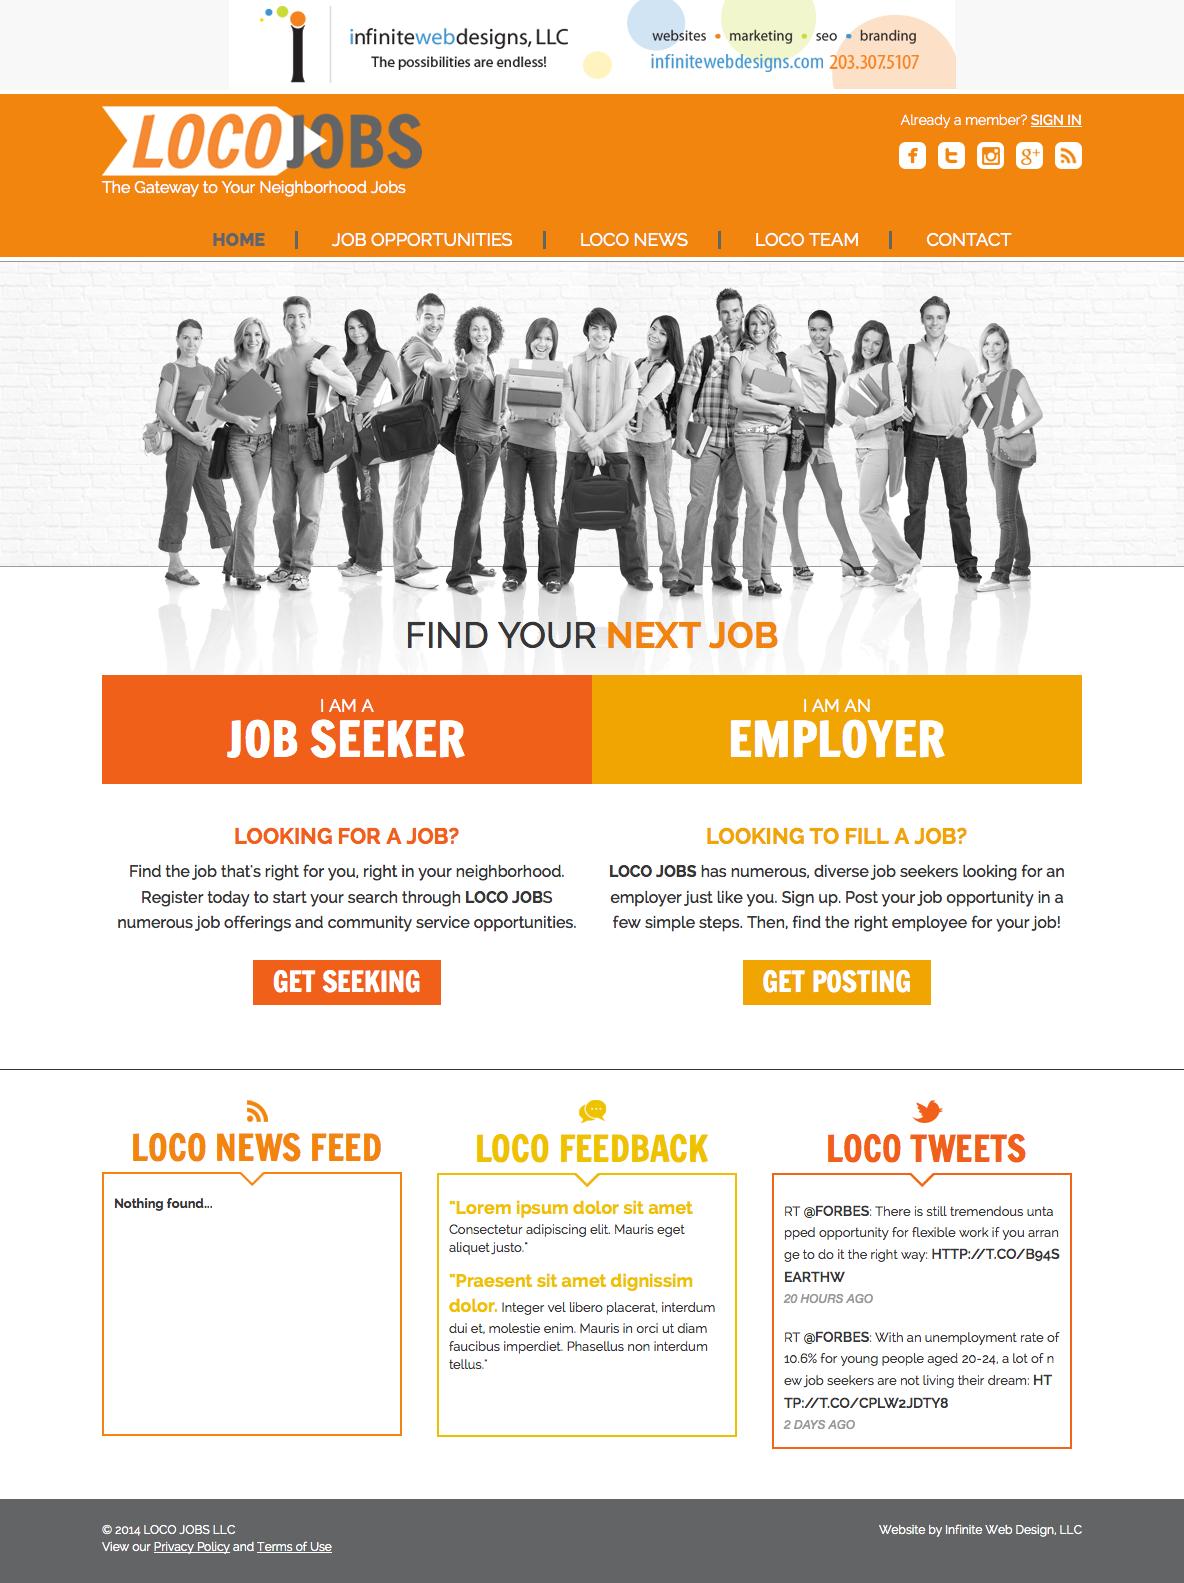 Loco Jobs